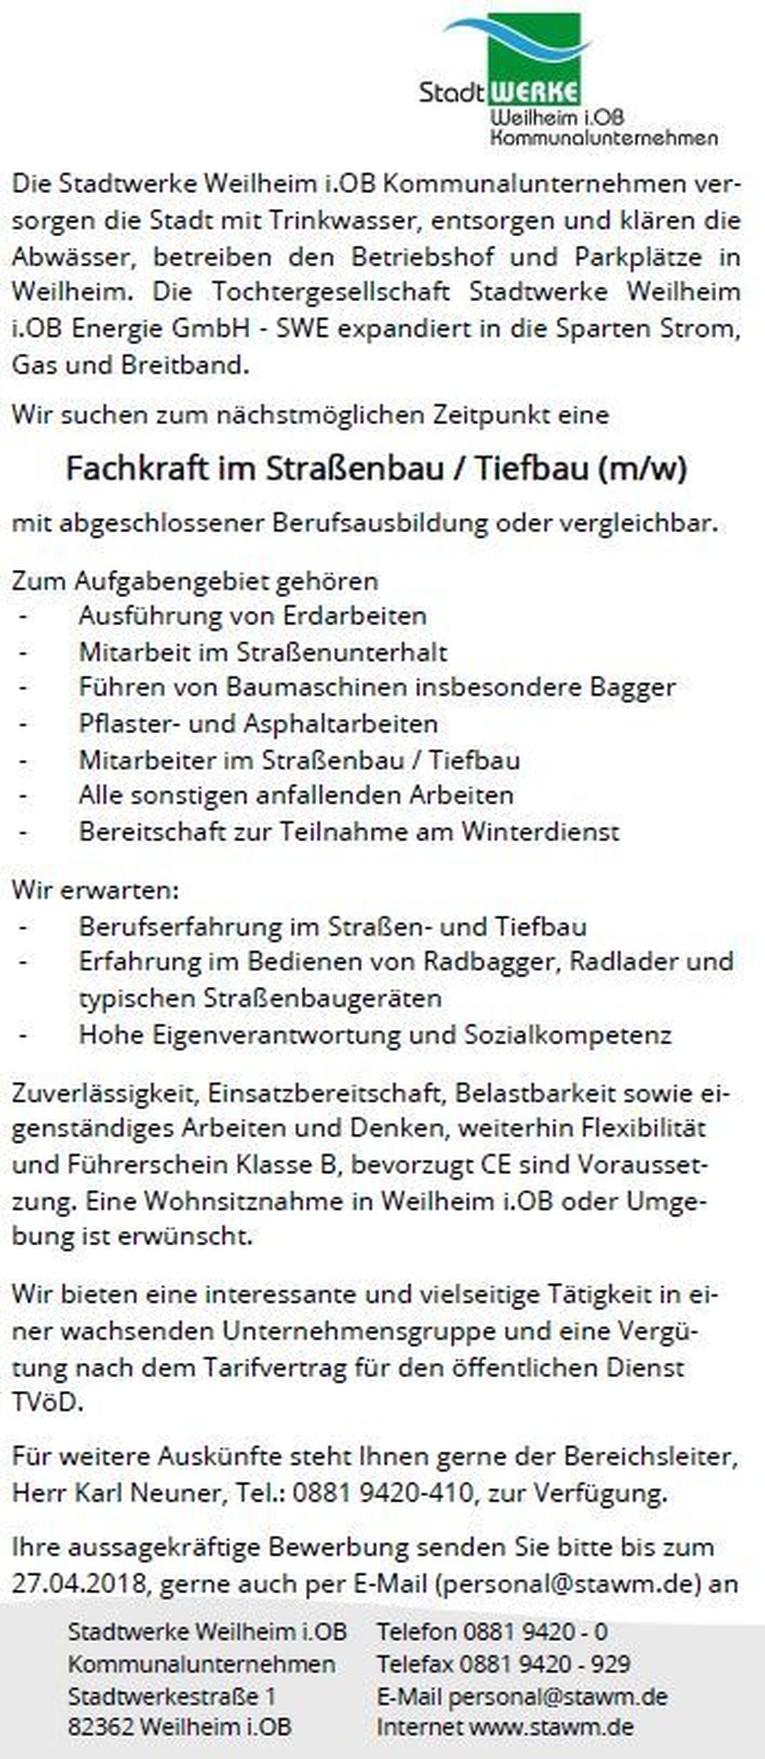 Fachkraft im Straßenbau / Tiefbau (m/w)